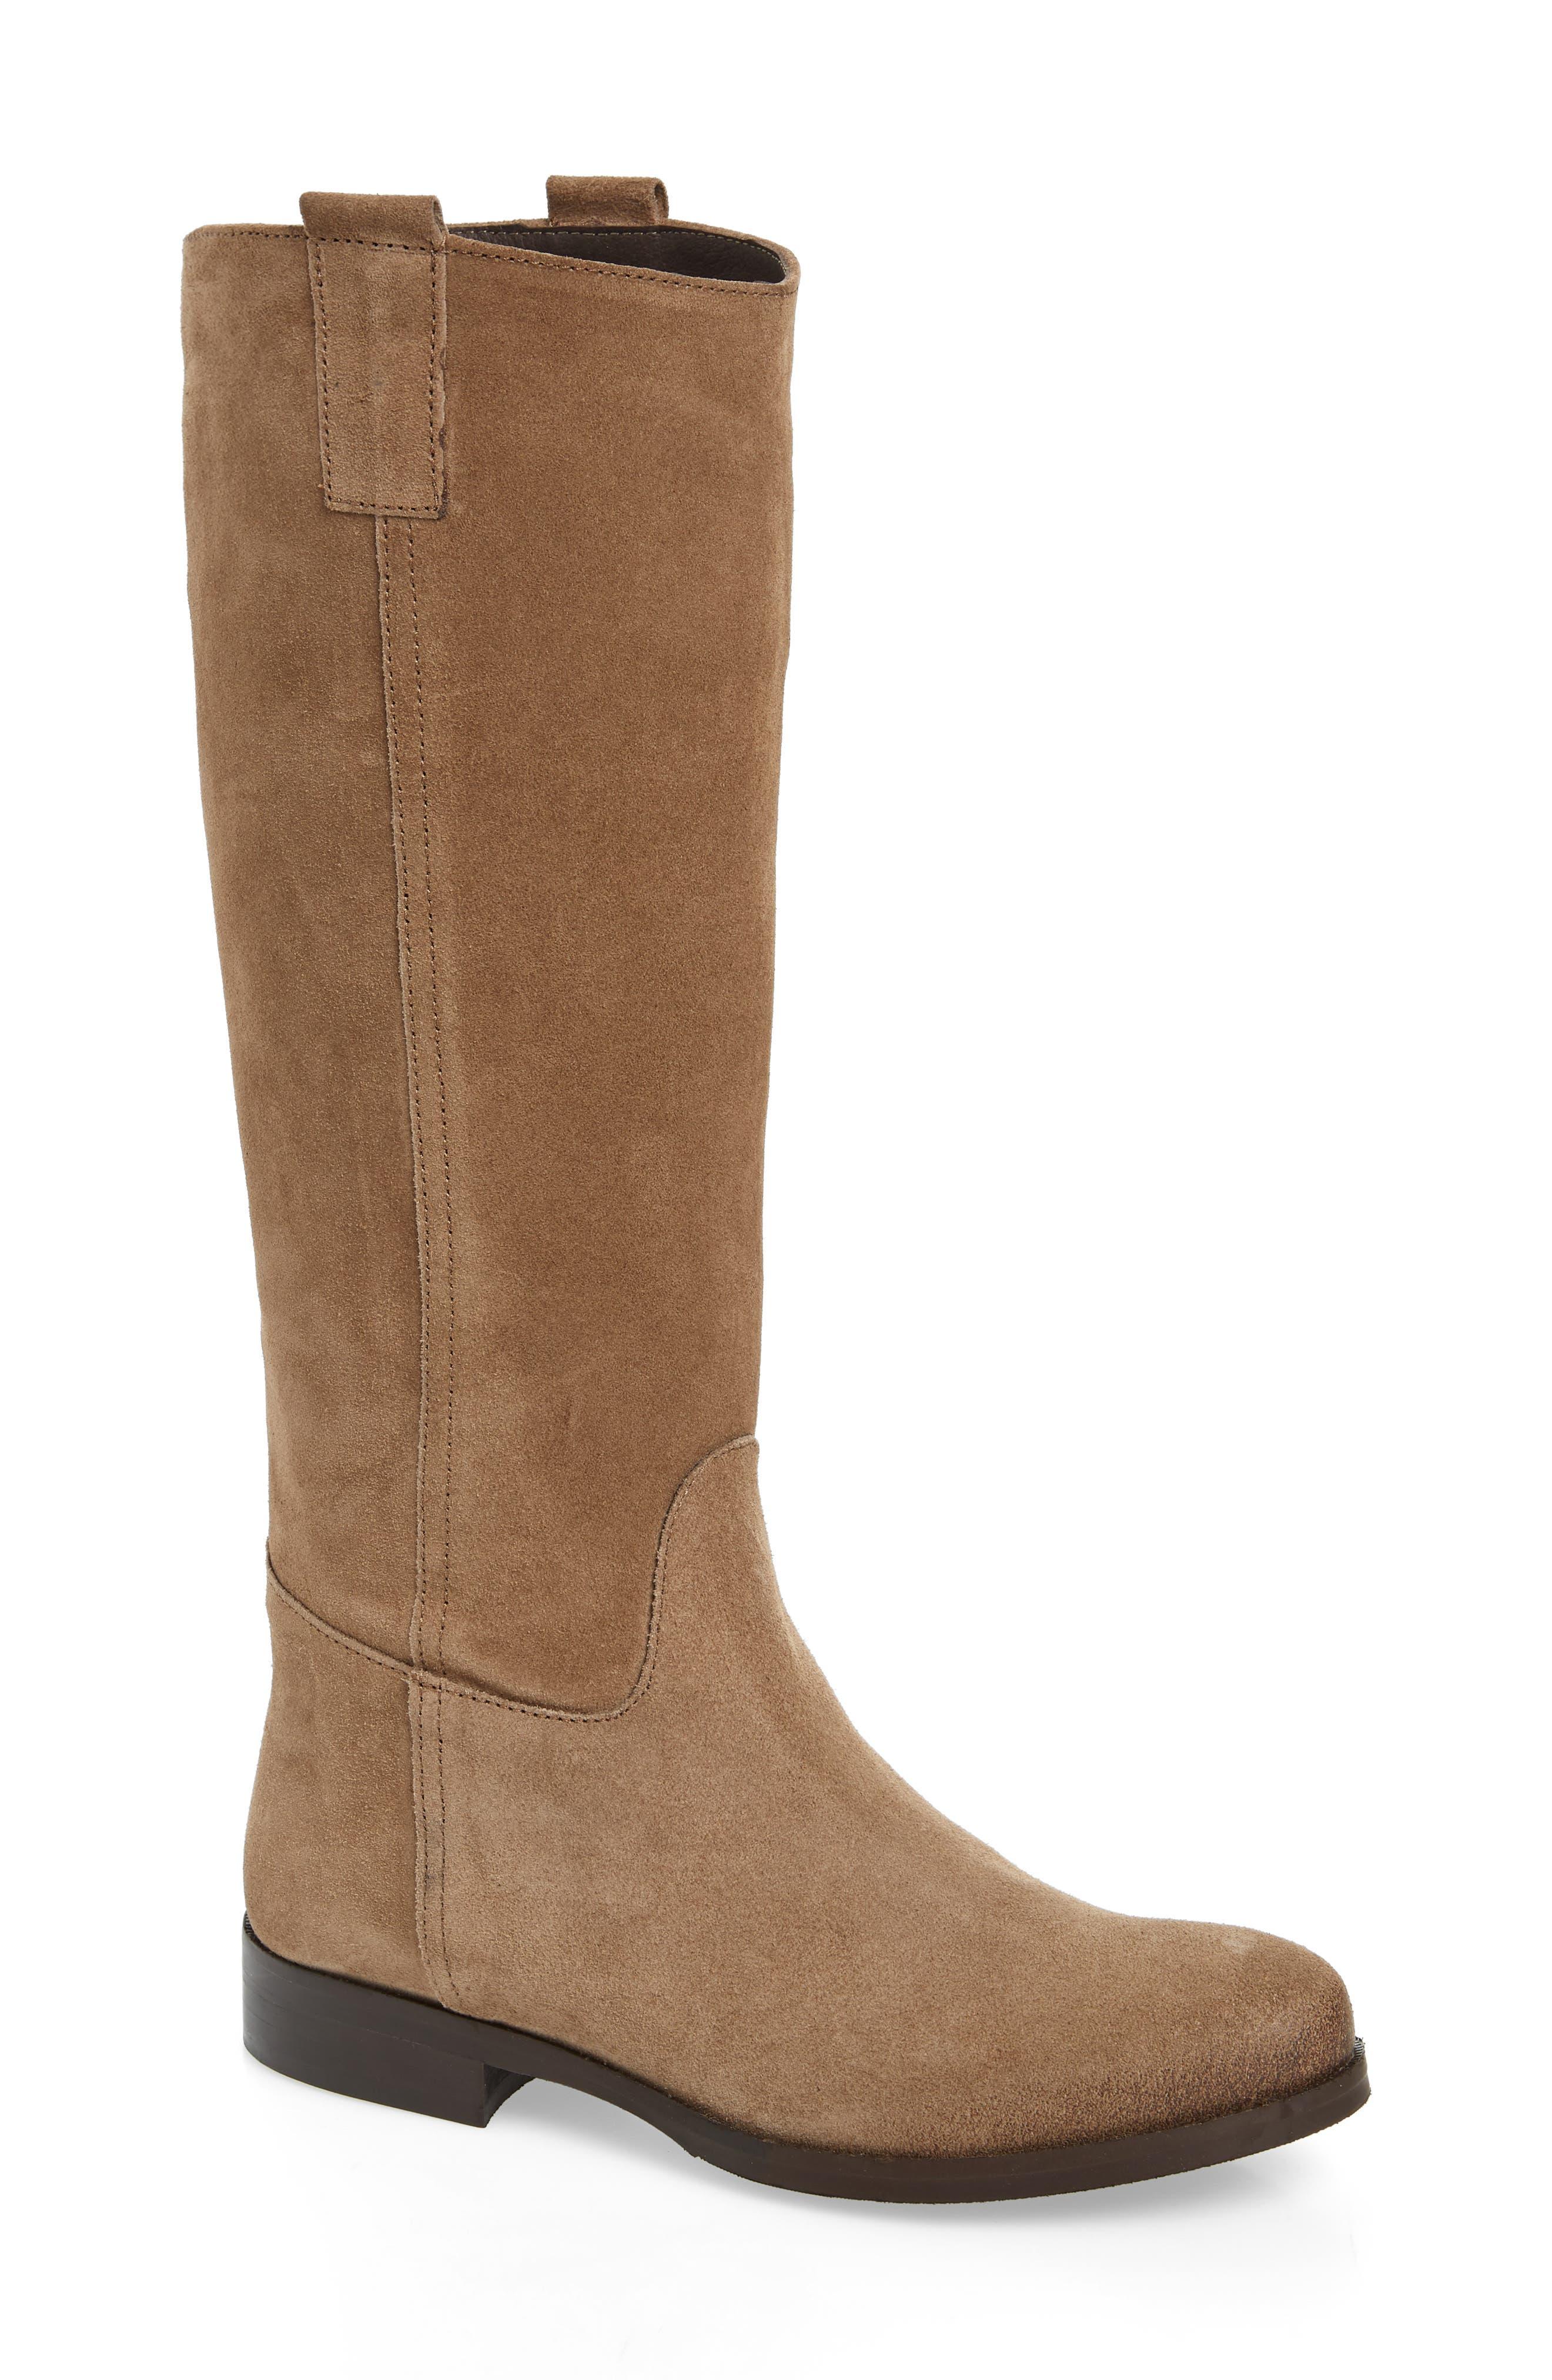 Cordani Benji Knee High Boot - Brown